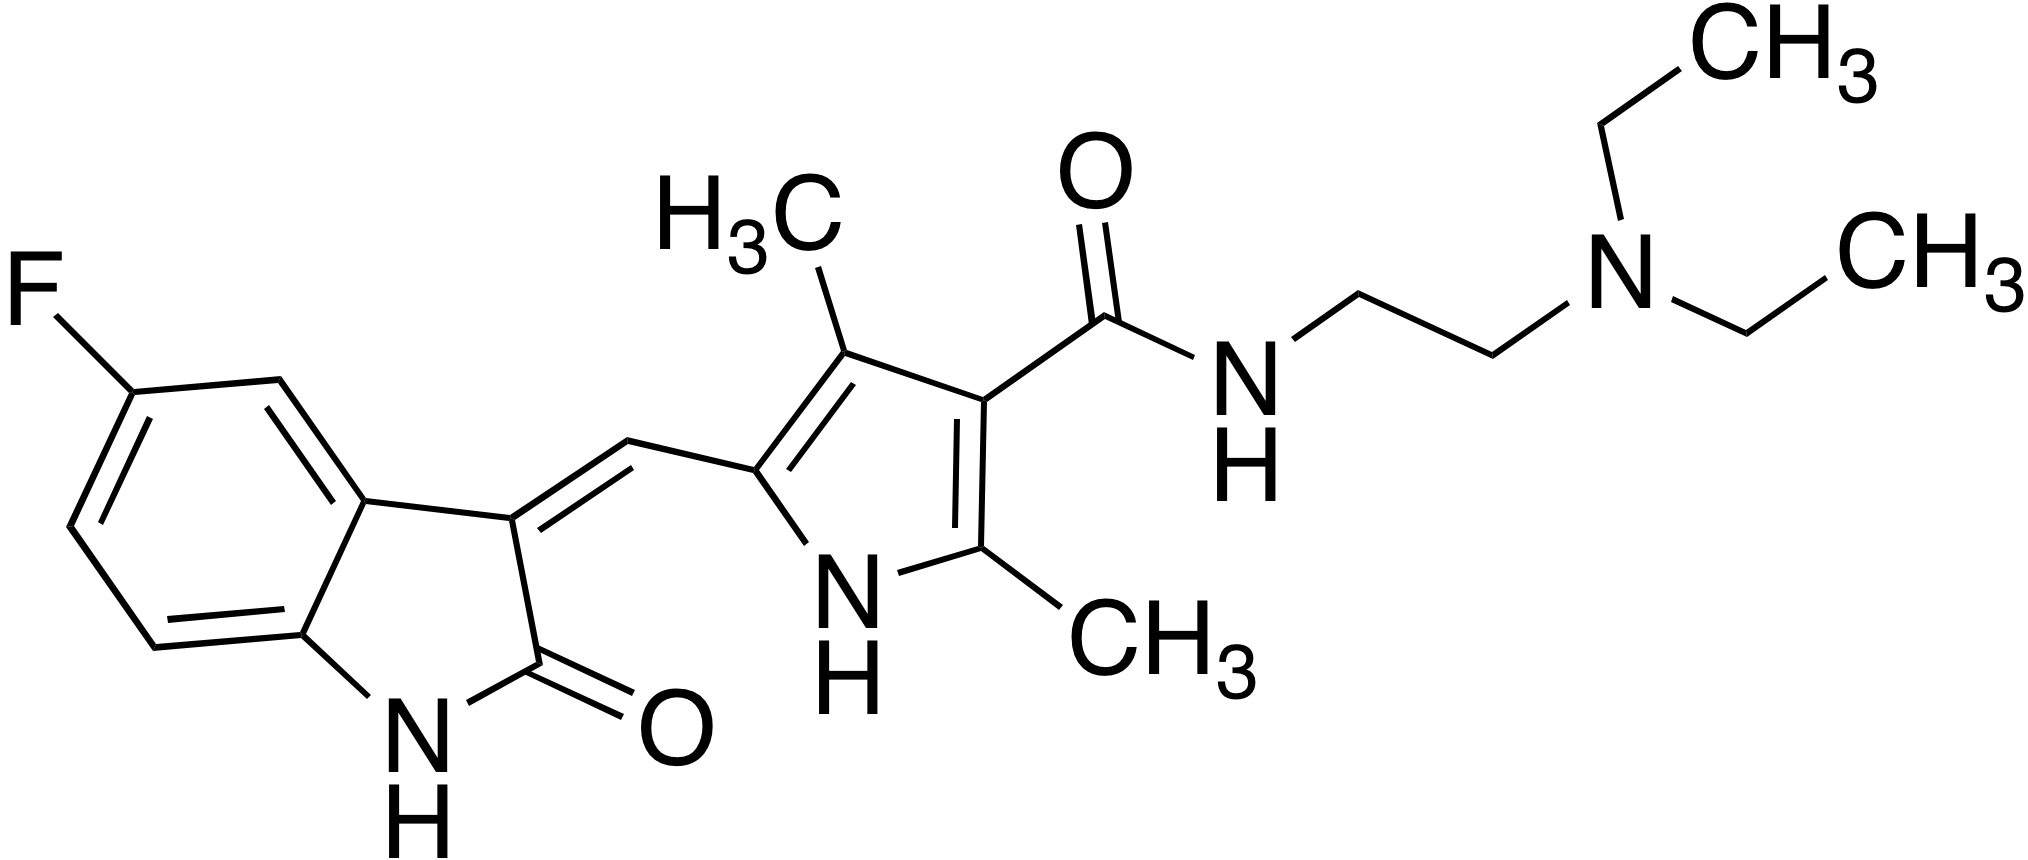 Sunitinib